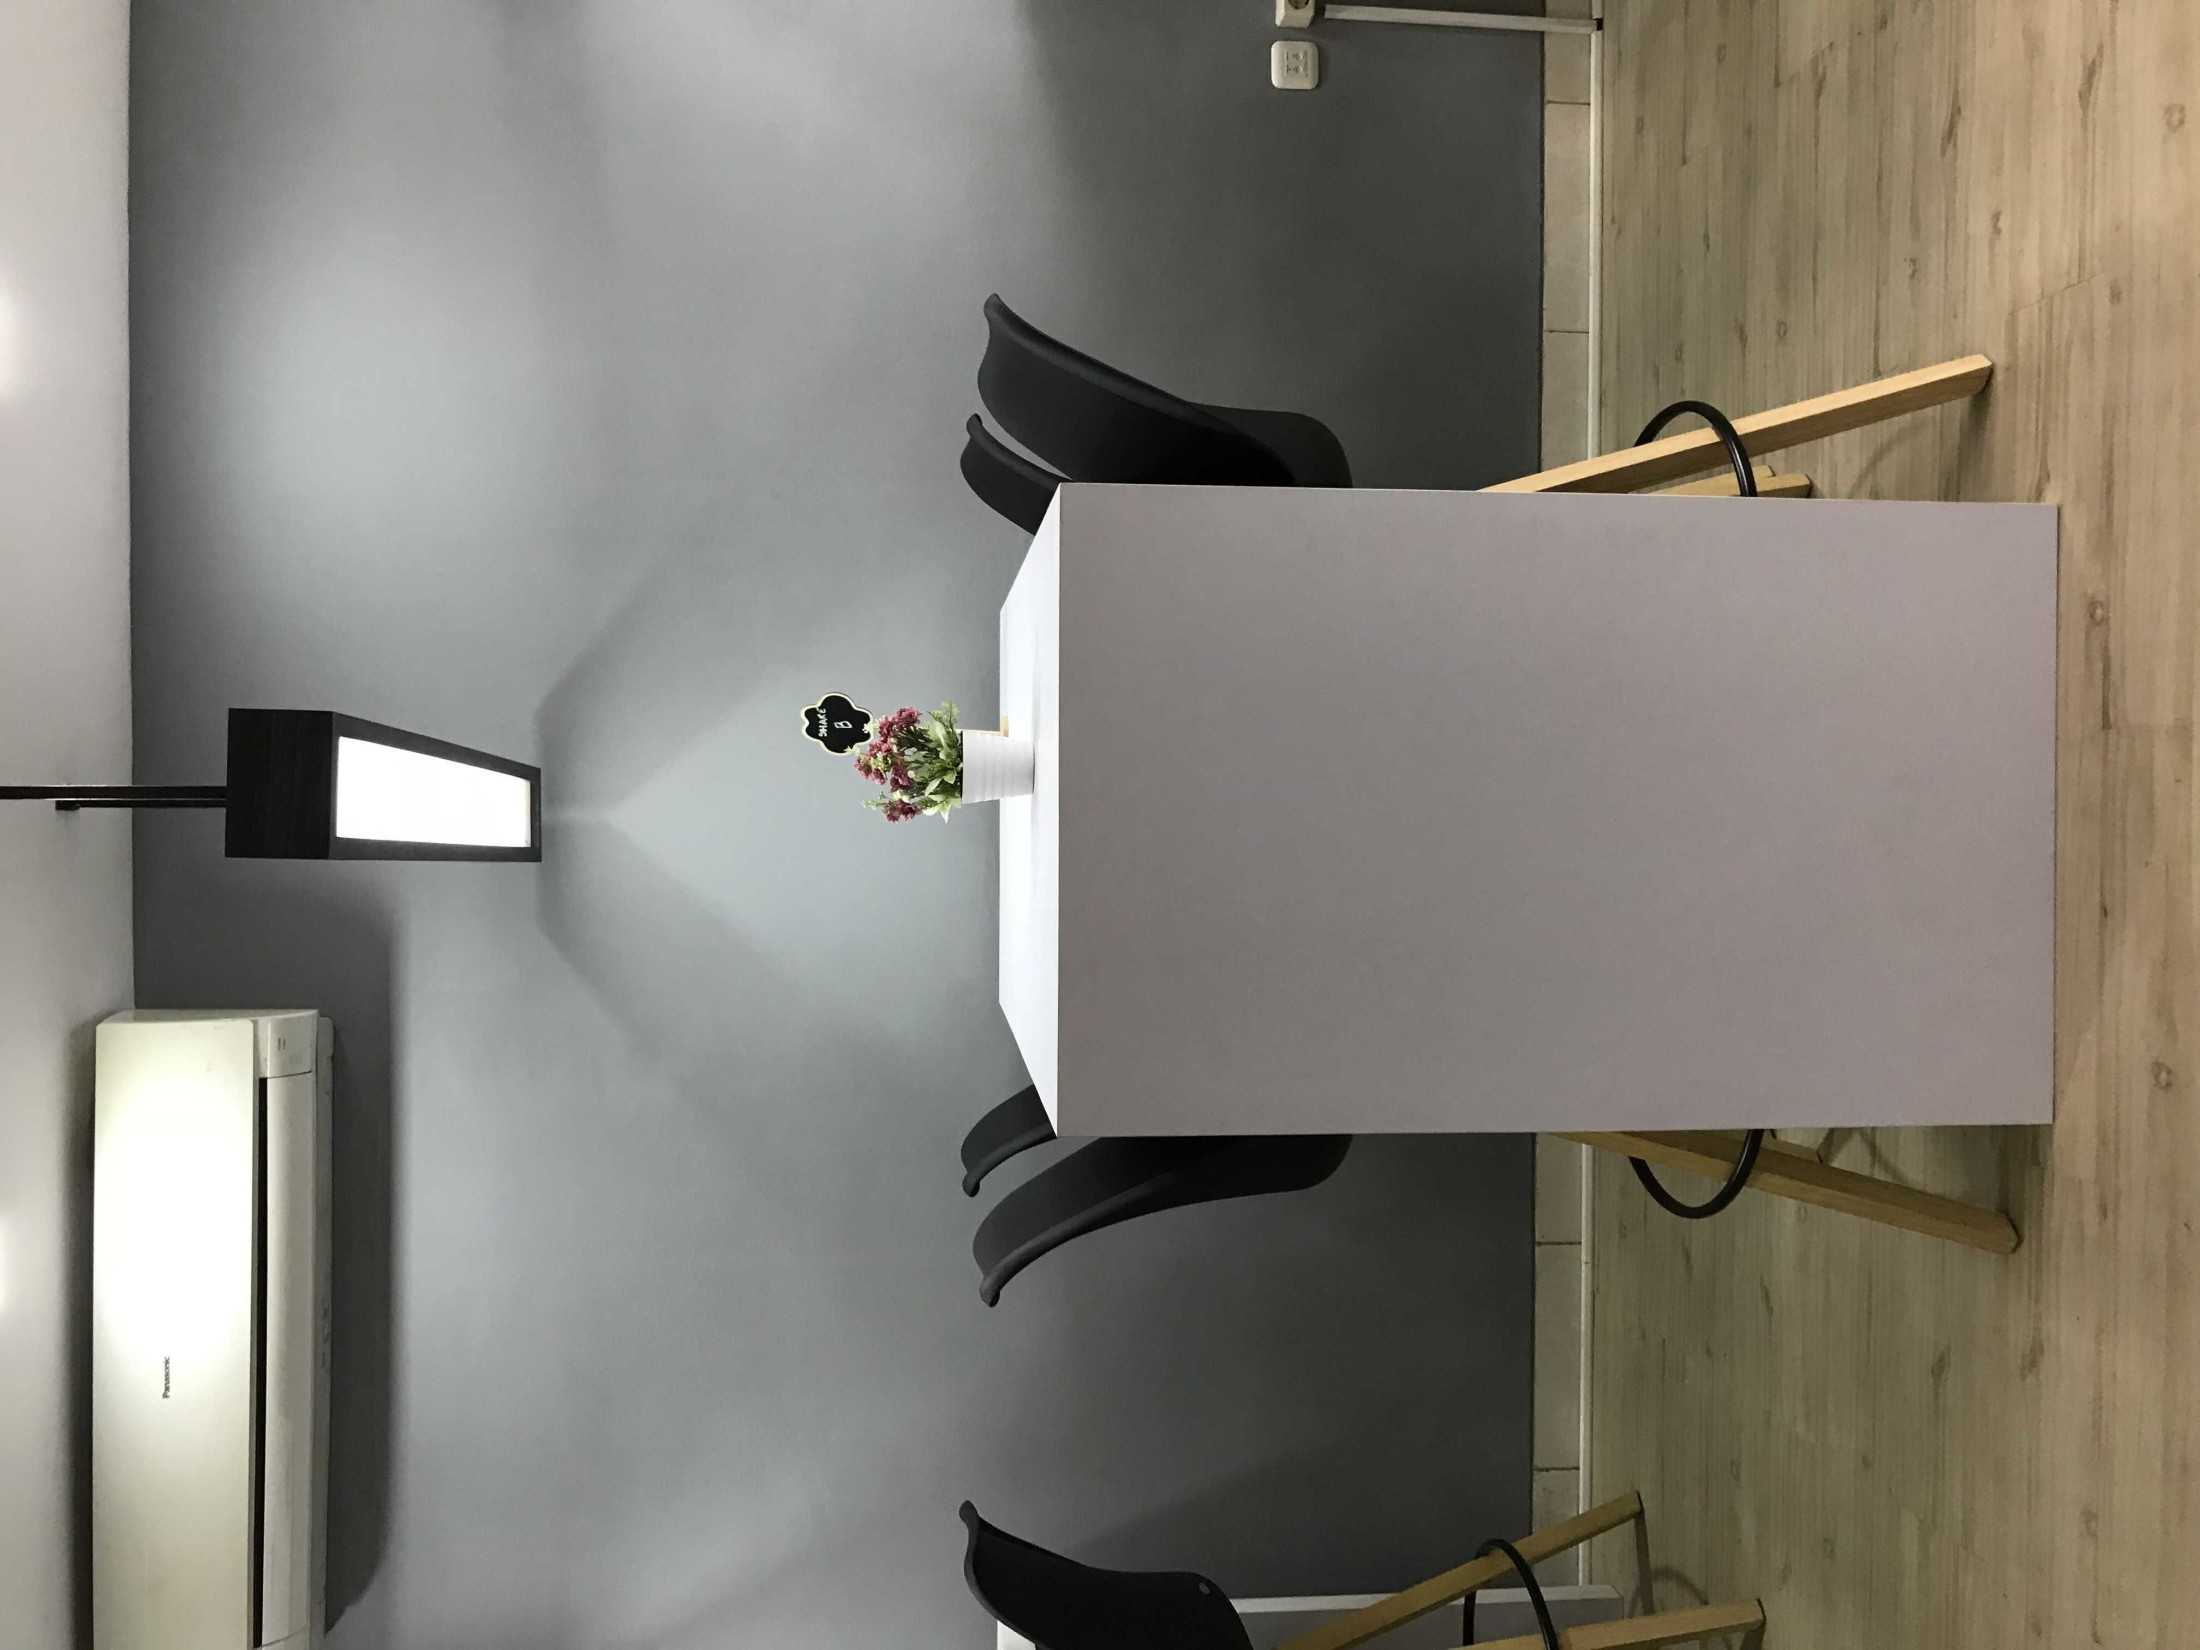 Ada Design Studio Office Plus Jl. Tj. Duren Timur 2 No.40-75, Rt.12/rw.1, Tj. Duren Sel., Grogol Petamburan, Kota Jakarta Barat, Daerah Khusus Ibukota Jakarta 11470, Indonesia Jl. Tj. Duren Timur 2 No.40-75, Rt.12/rw.1, Tj. Duren Sel., Grogol Petamburan, Kota Jakarta Barat, Daerah Khusus Ibukota Jakarta 11470, Indonesia Ada-Home-Office-Plus  68991